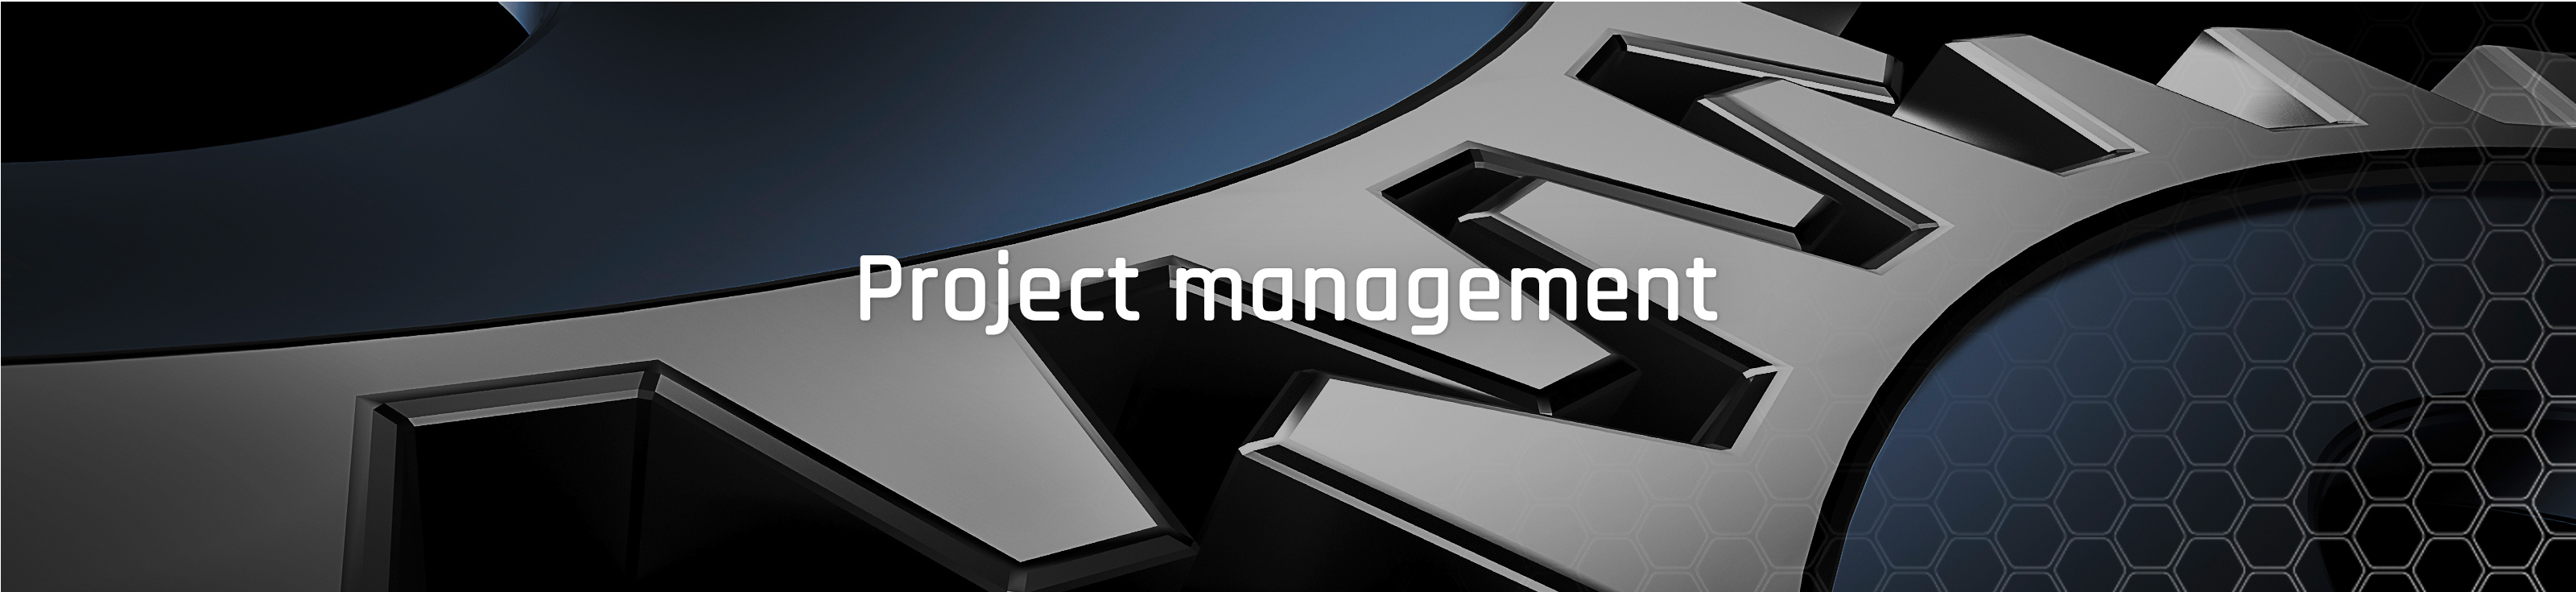 Slider_project_management_ps